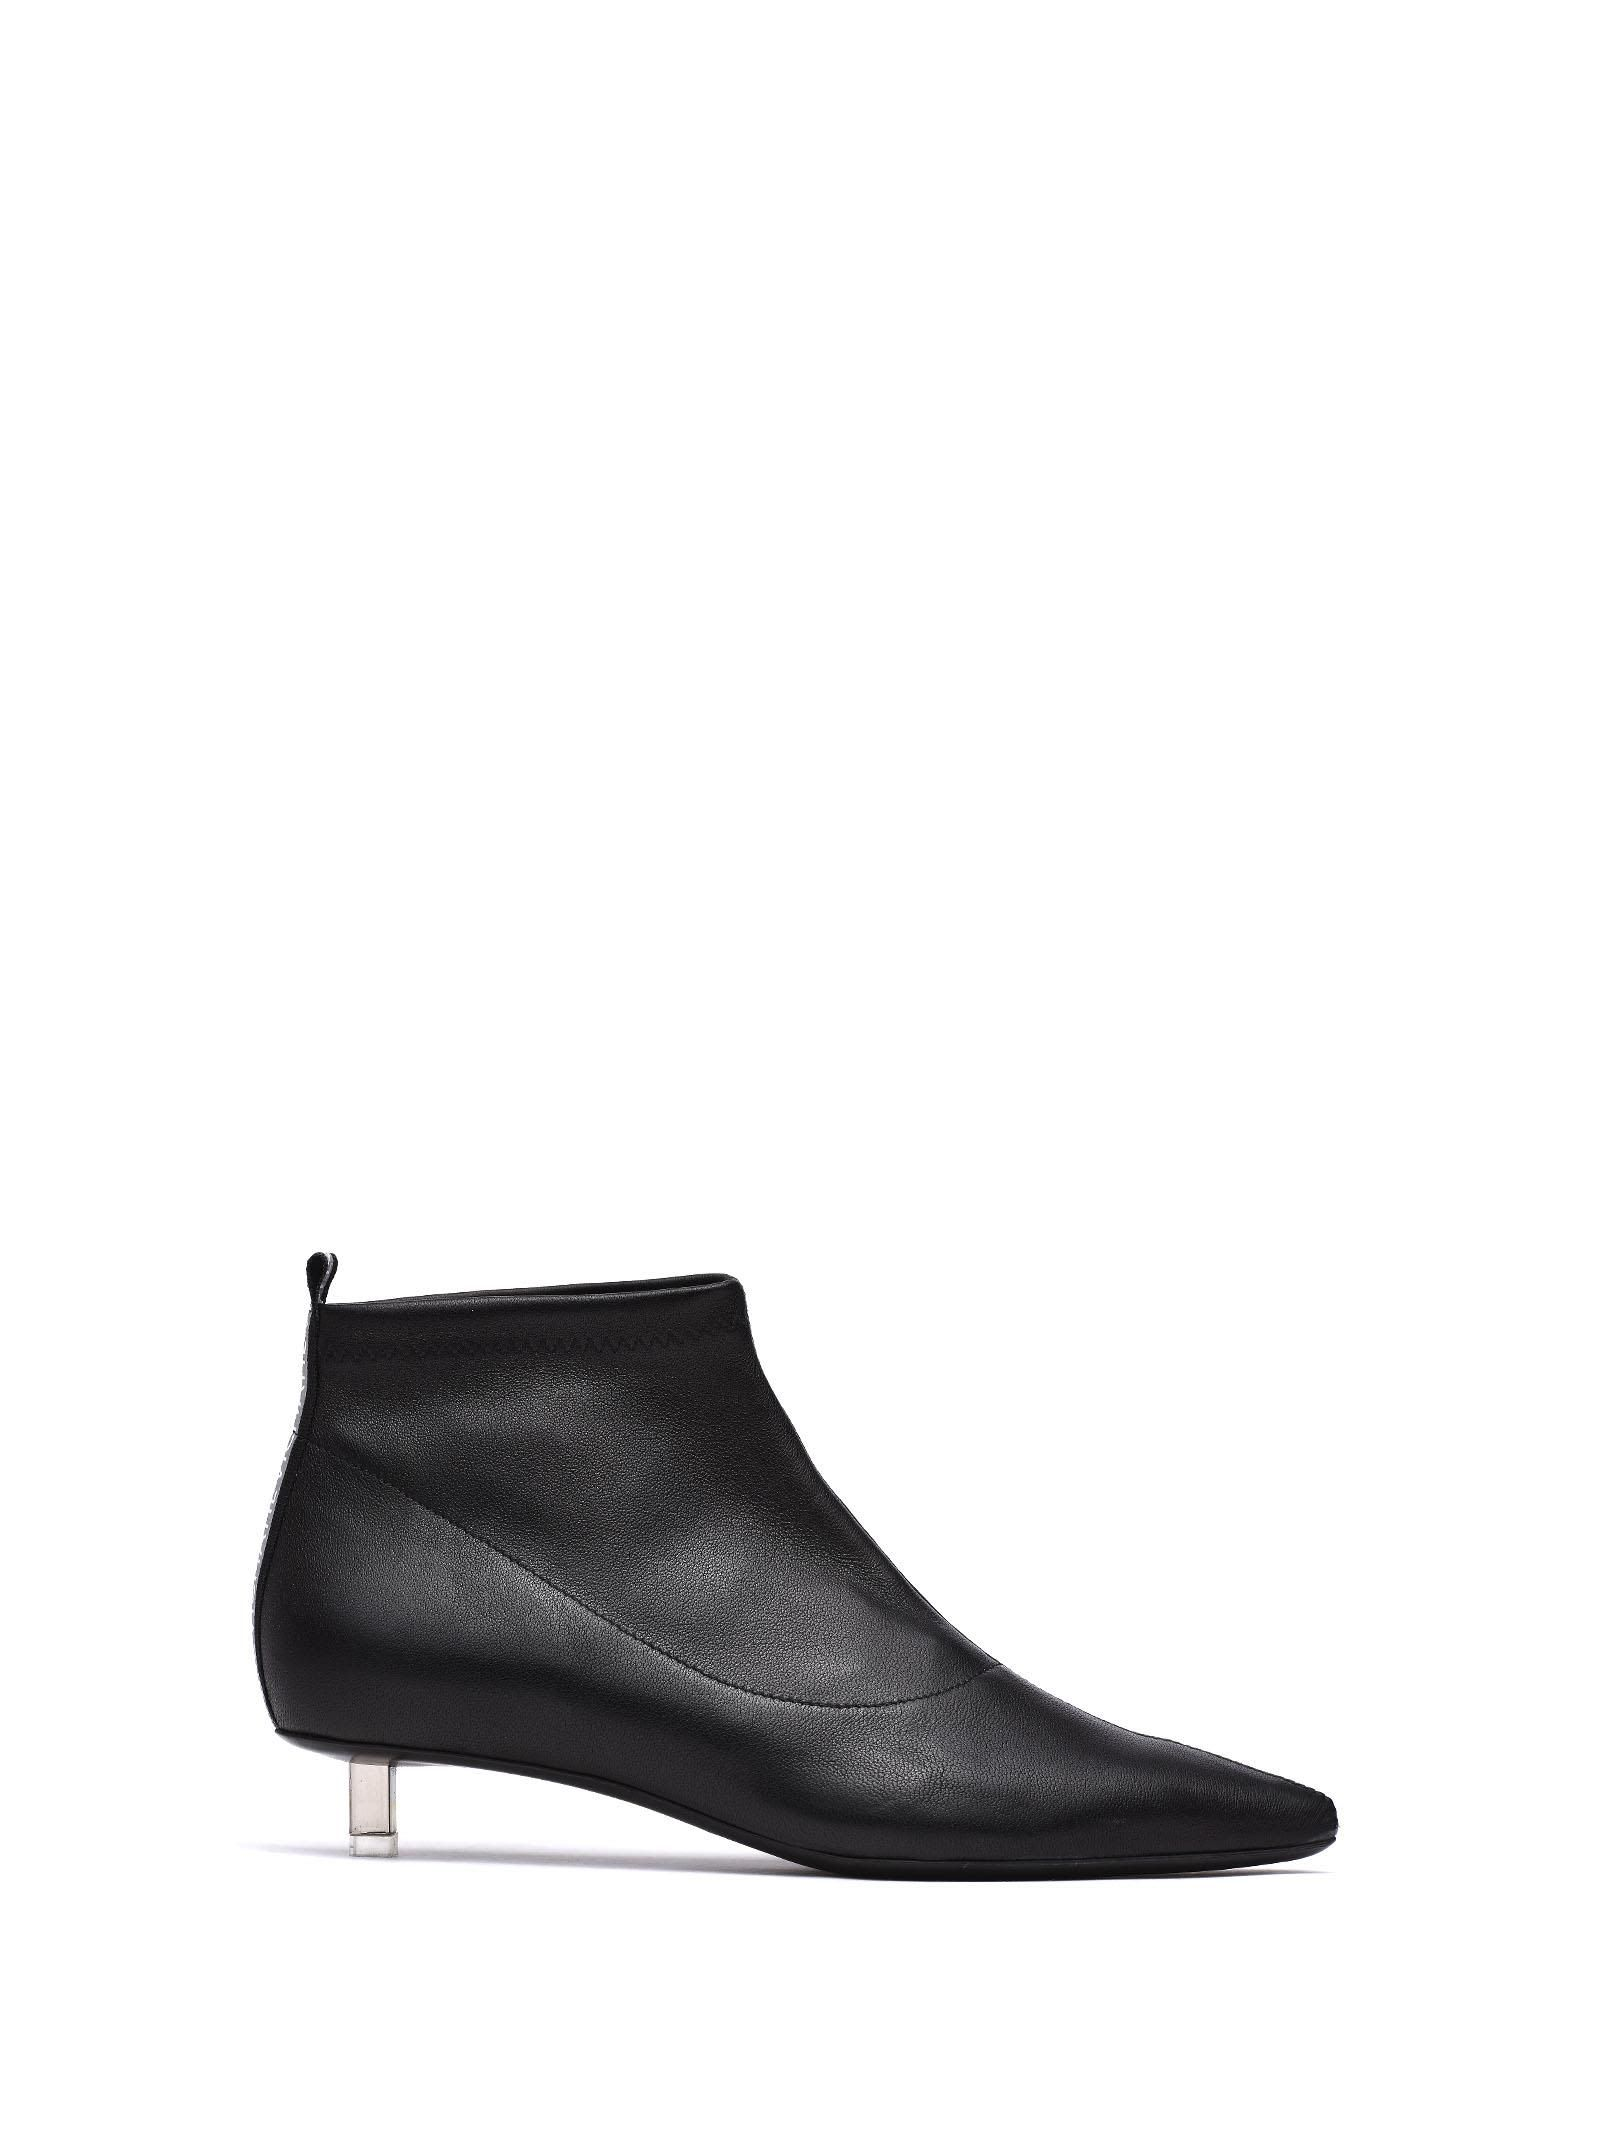 8915684c503 VIC MATIE VIC MATIE BLACK STRETCH LEATHER HALF BOOT.  vicmatie  shoes